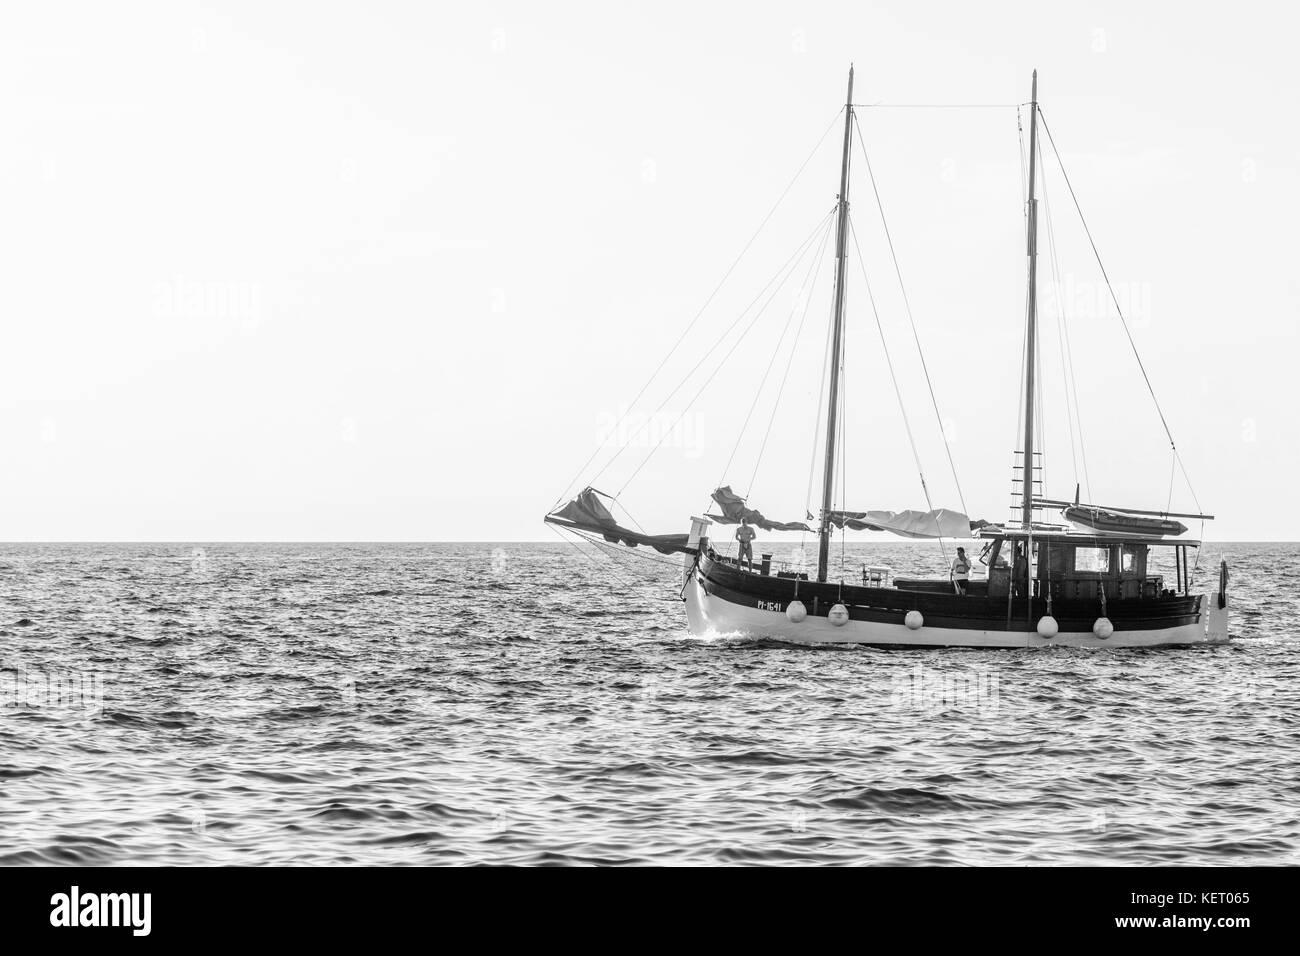 Piran in summer 2017 - Stock Image